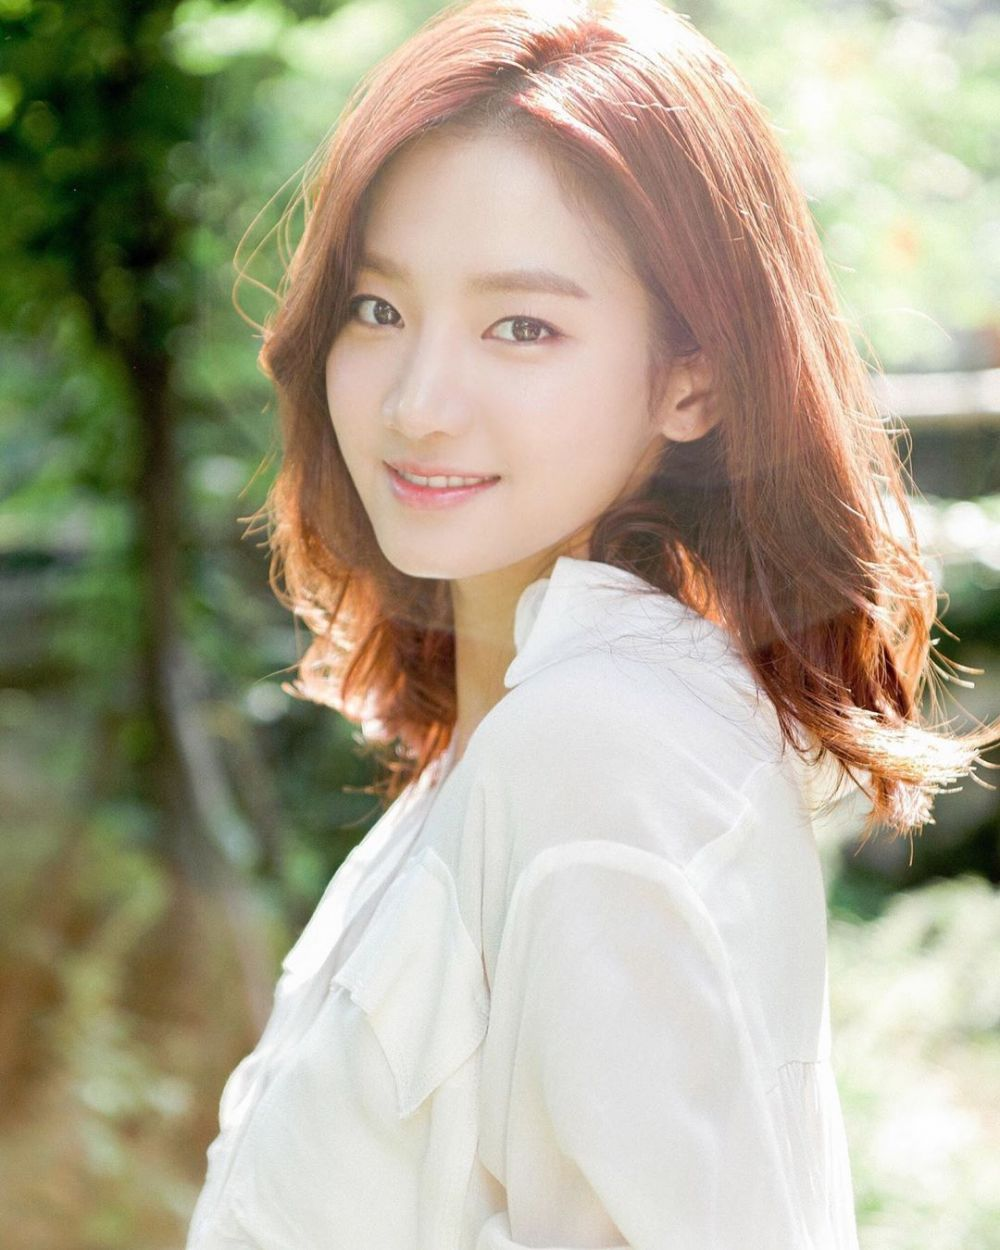 Aktris Park Joo Hyun pemeran drama Korea Mouse.